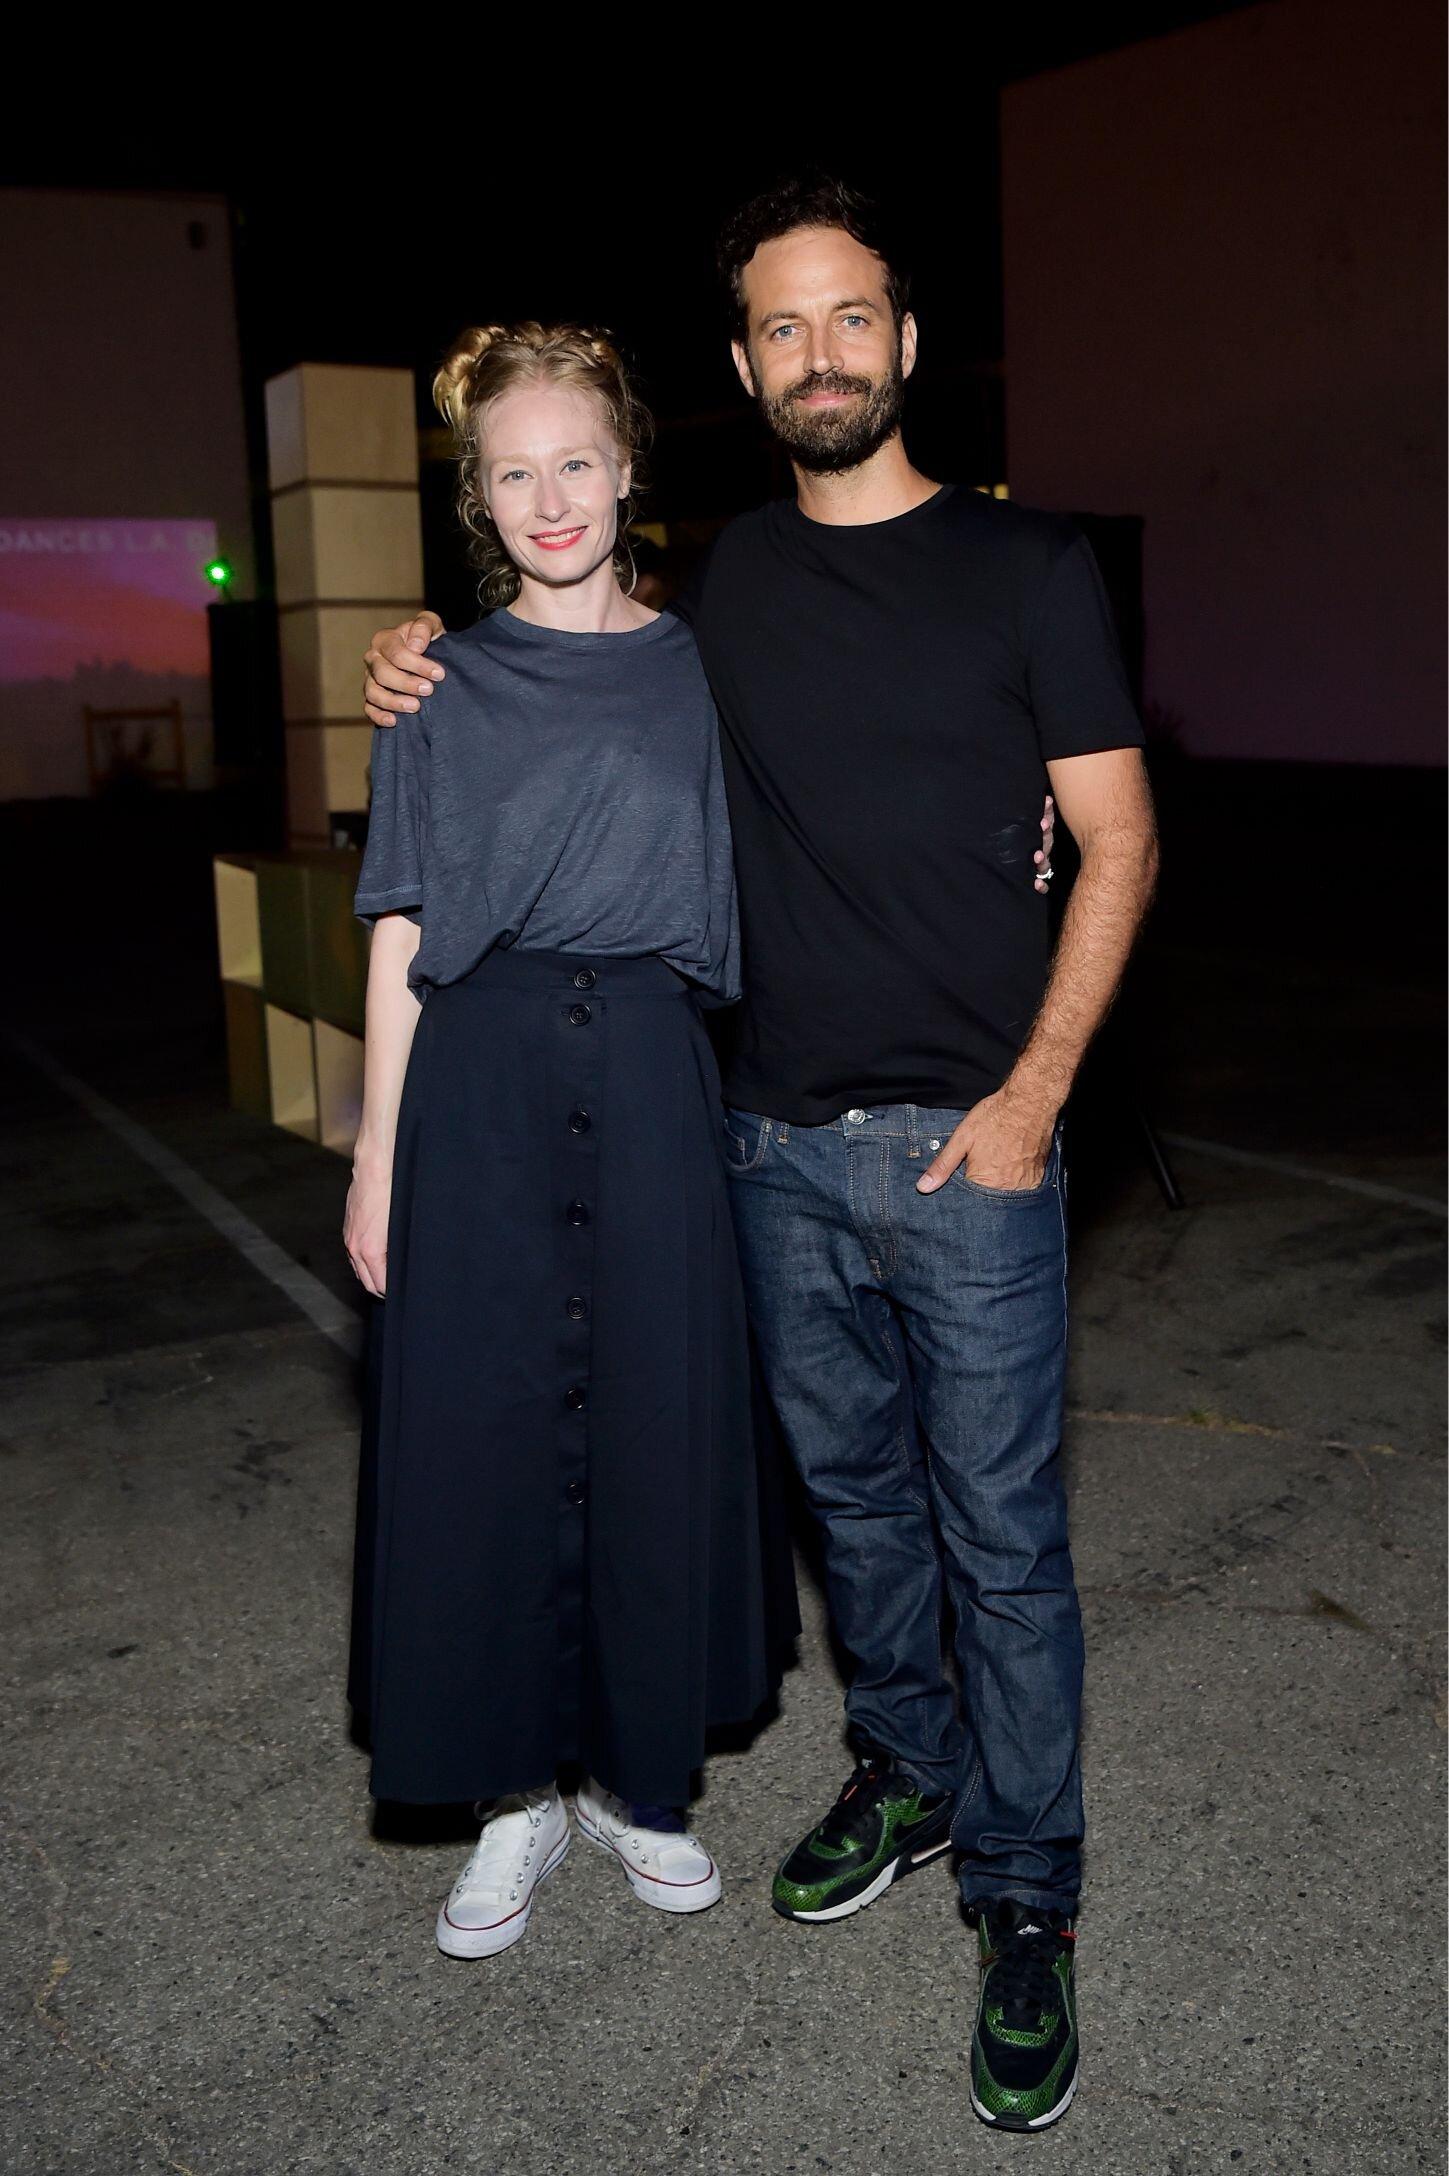 Janie Taylor and Benjamin Millepeid